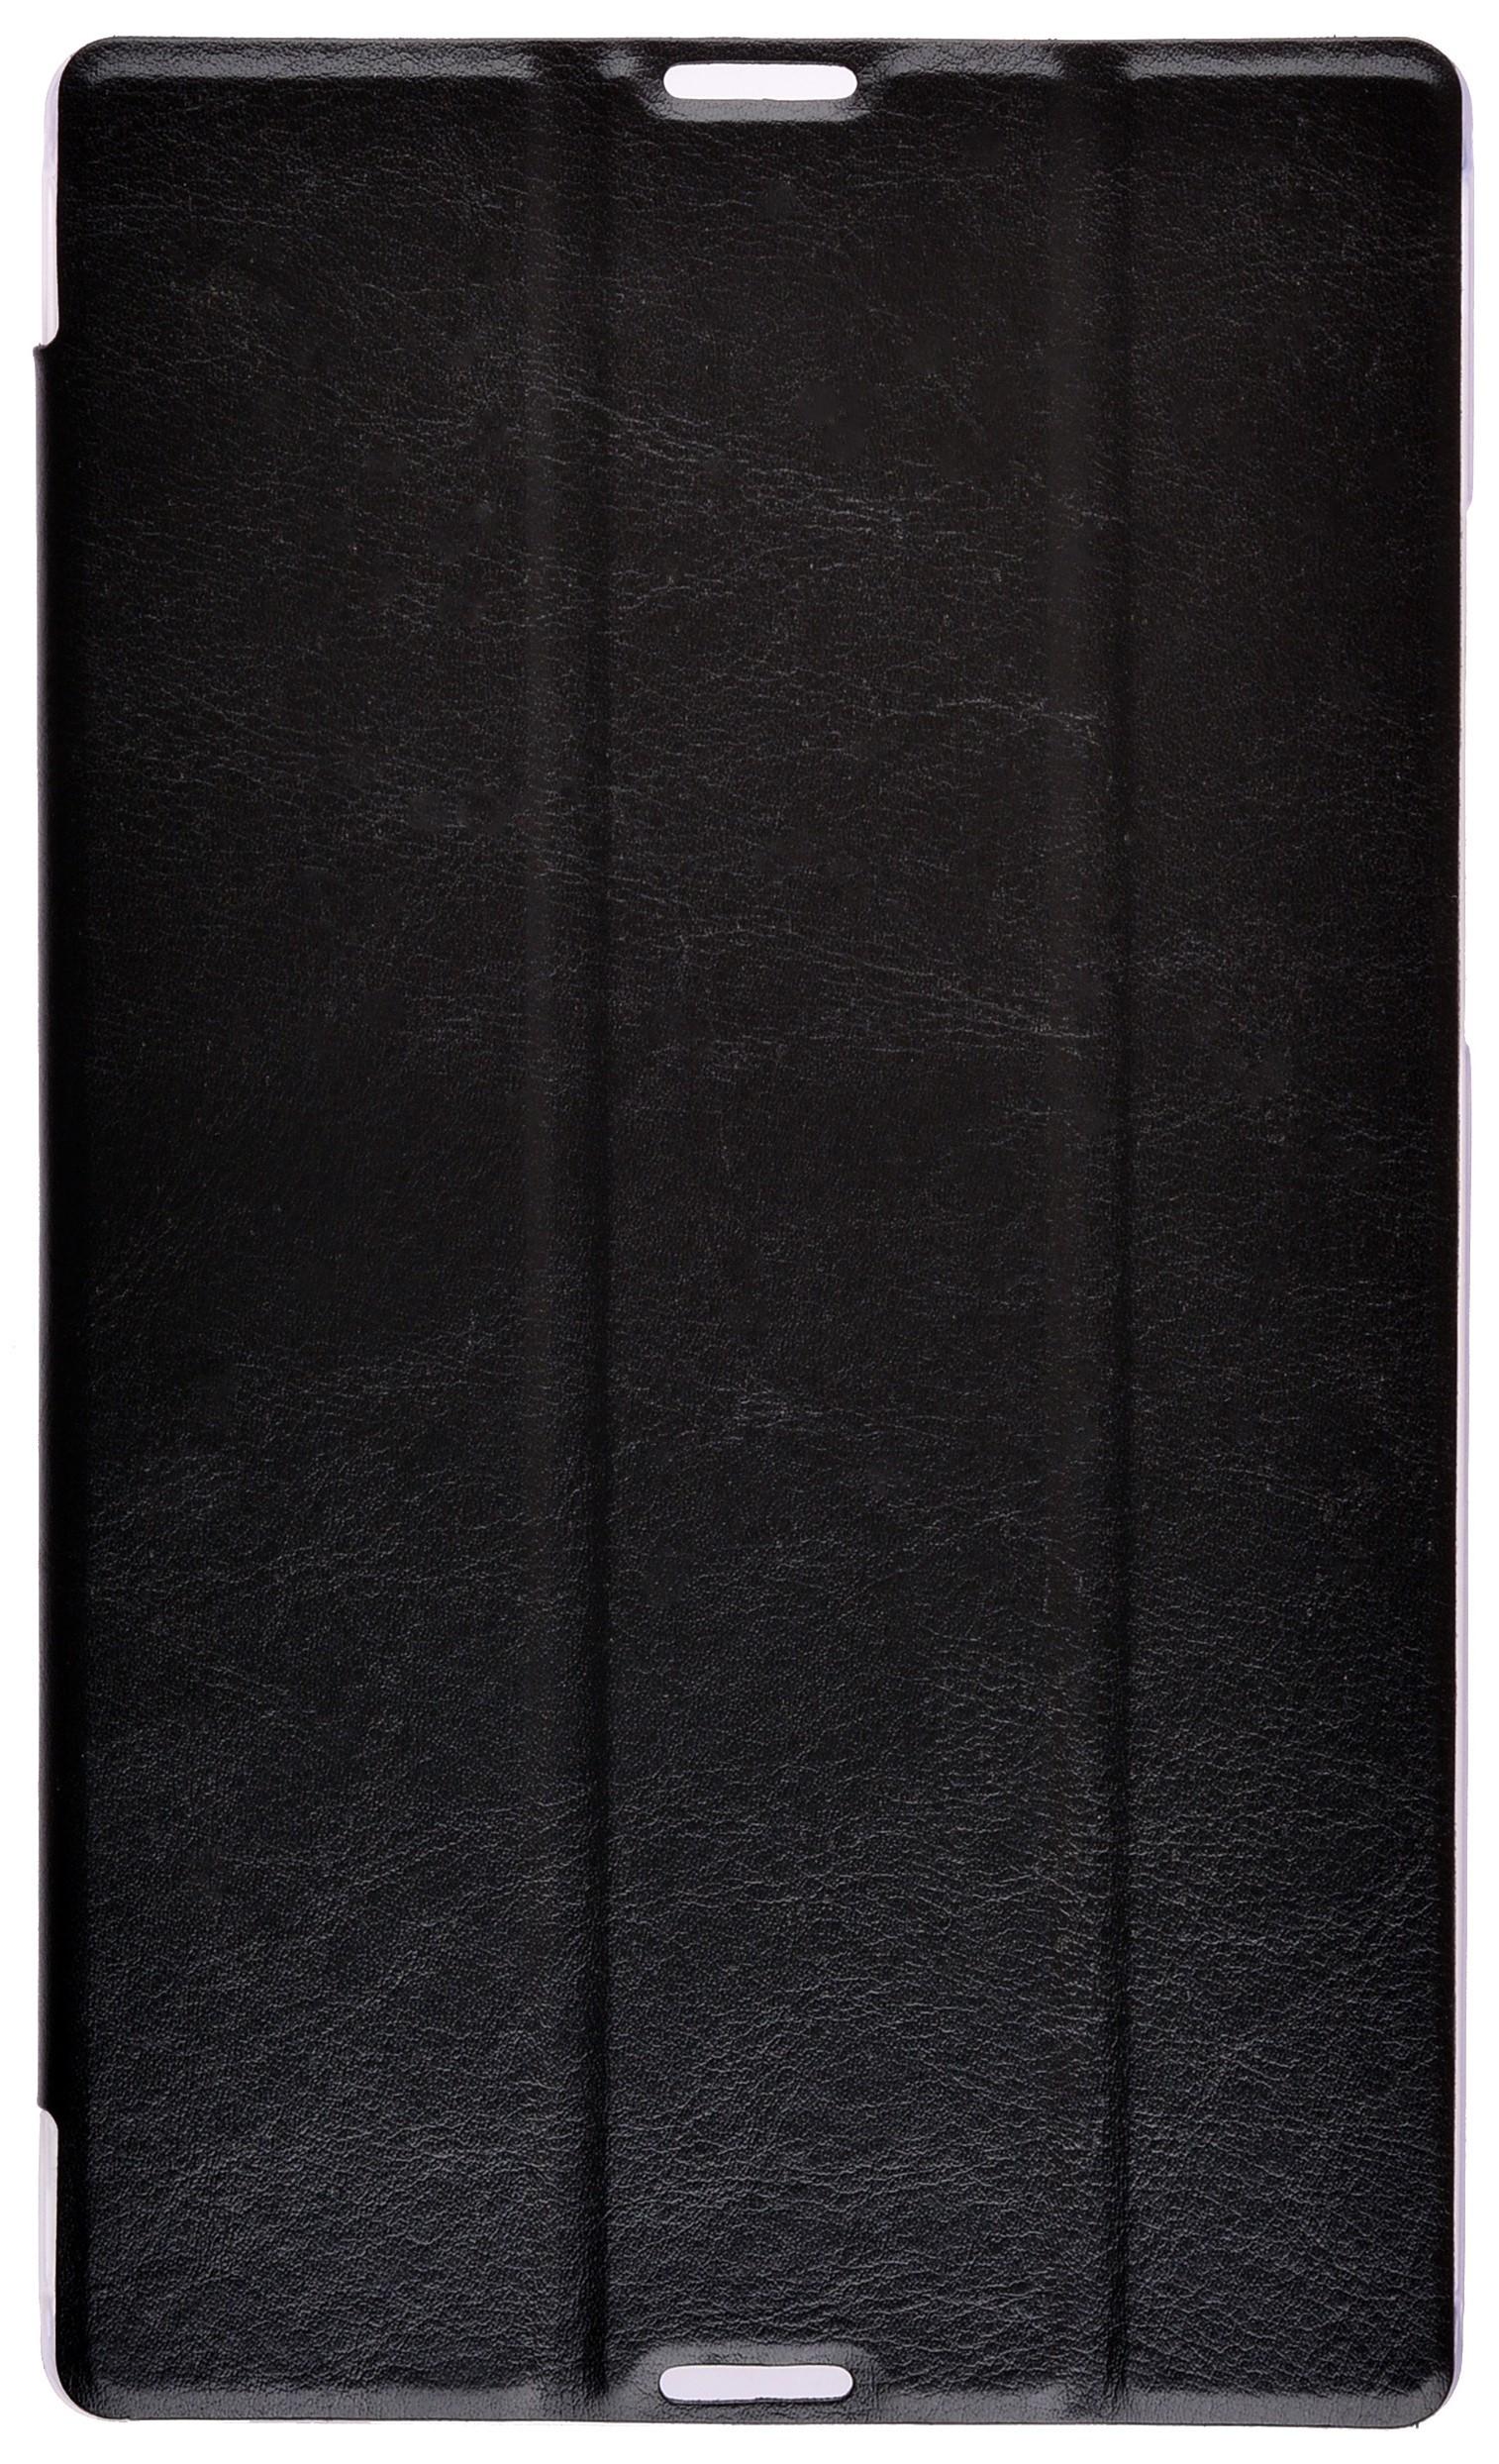 Чехол для планшета ProShield Smart, 4630042528550, черный смартфон lenovo phab plus pb1 770m 32 гб золотистый za070035ru